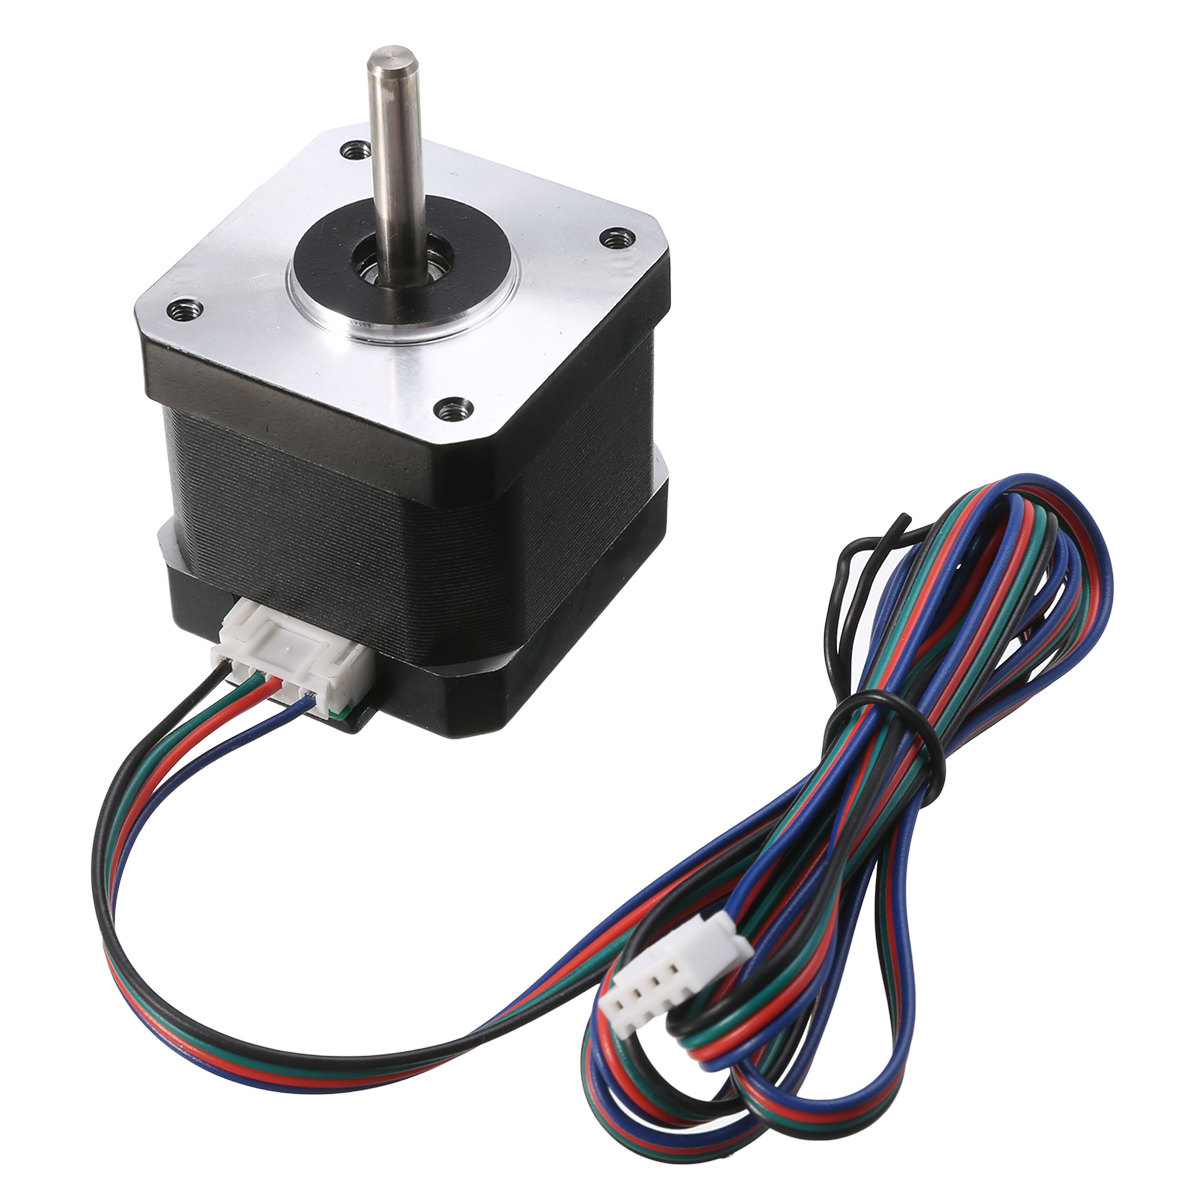 1pc CNC 1.8 Degree NEMA17 Stepper Motor 1.7A 40mm 2 Phase 4-wire Stepper Motor For 3D Printer Accessories1pc CNC 1.8 Degree NEMA17 Stepper Motor 1.7A 40mm 2 Phase 4-wire Stepper Motor For 3D Printer Accessories